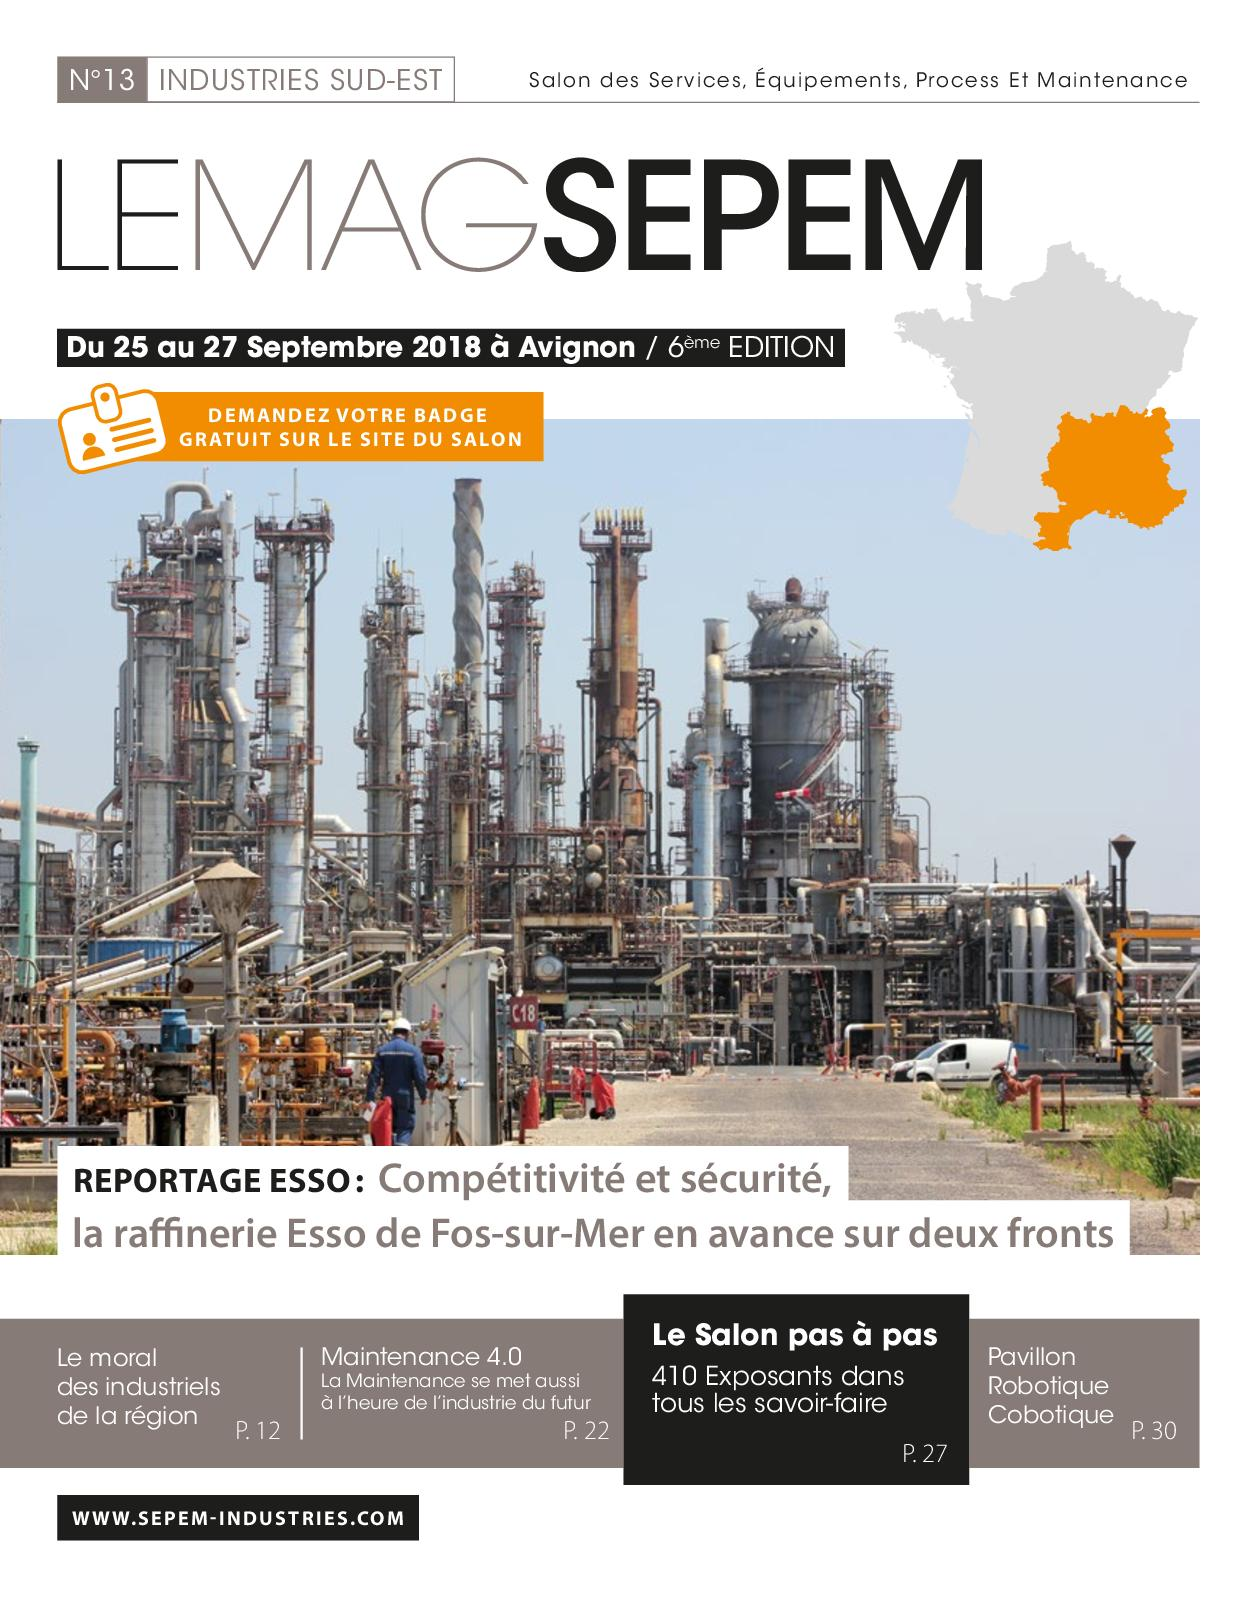 Calaméo - SEPEM Avignon 2018 - Magazine du salon c470509ced71